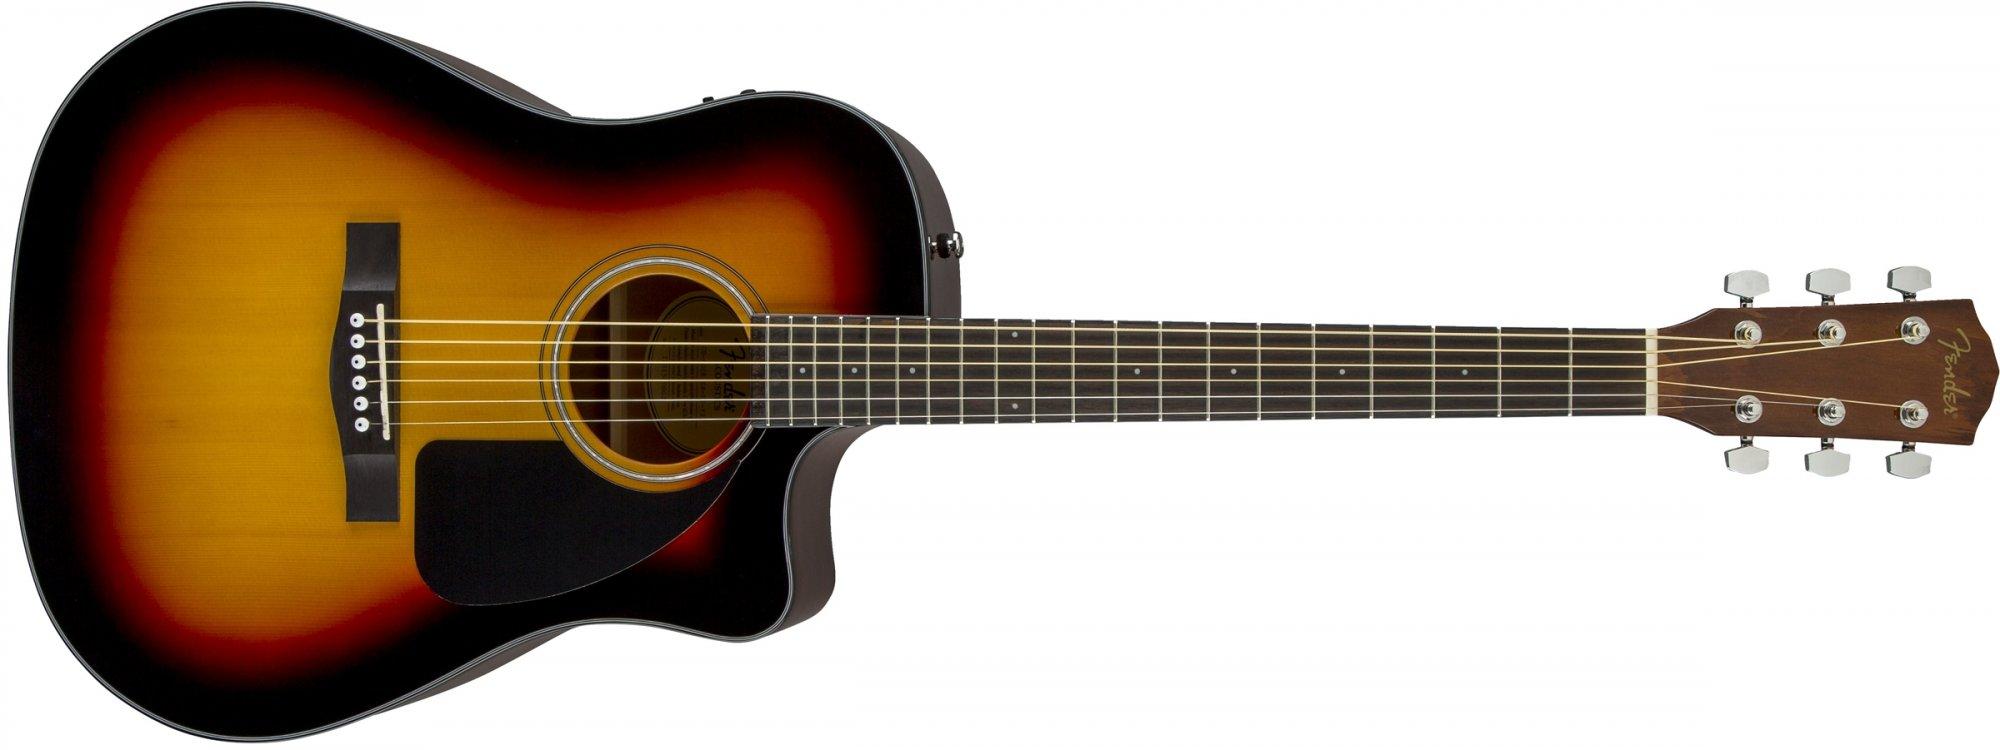 Fender CD60CE Cutaway Dreadnought Acoustic-Electric Guitar - Sunburst